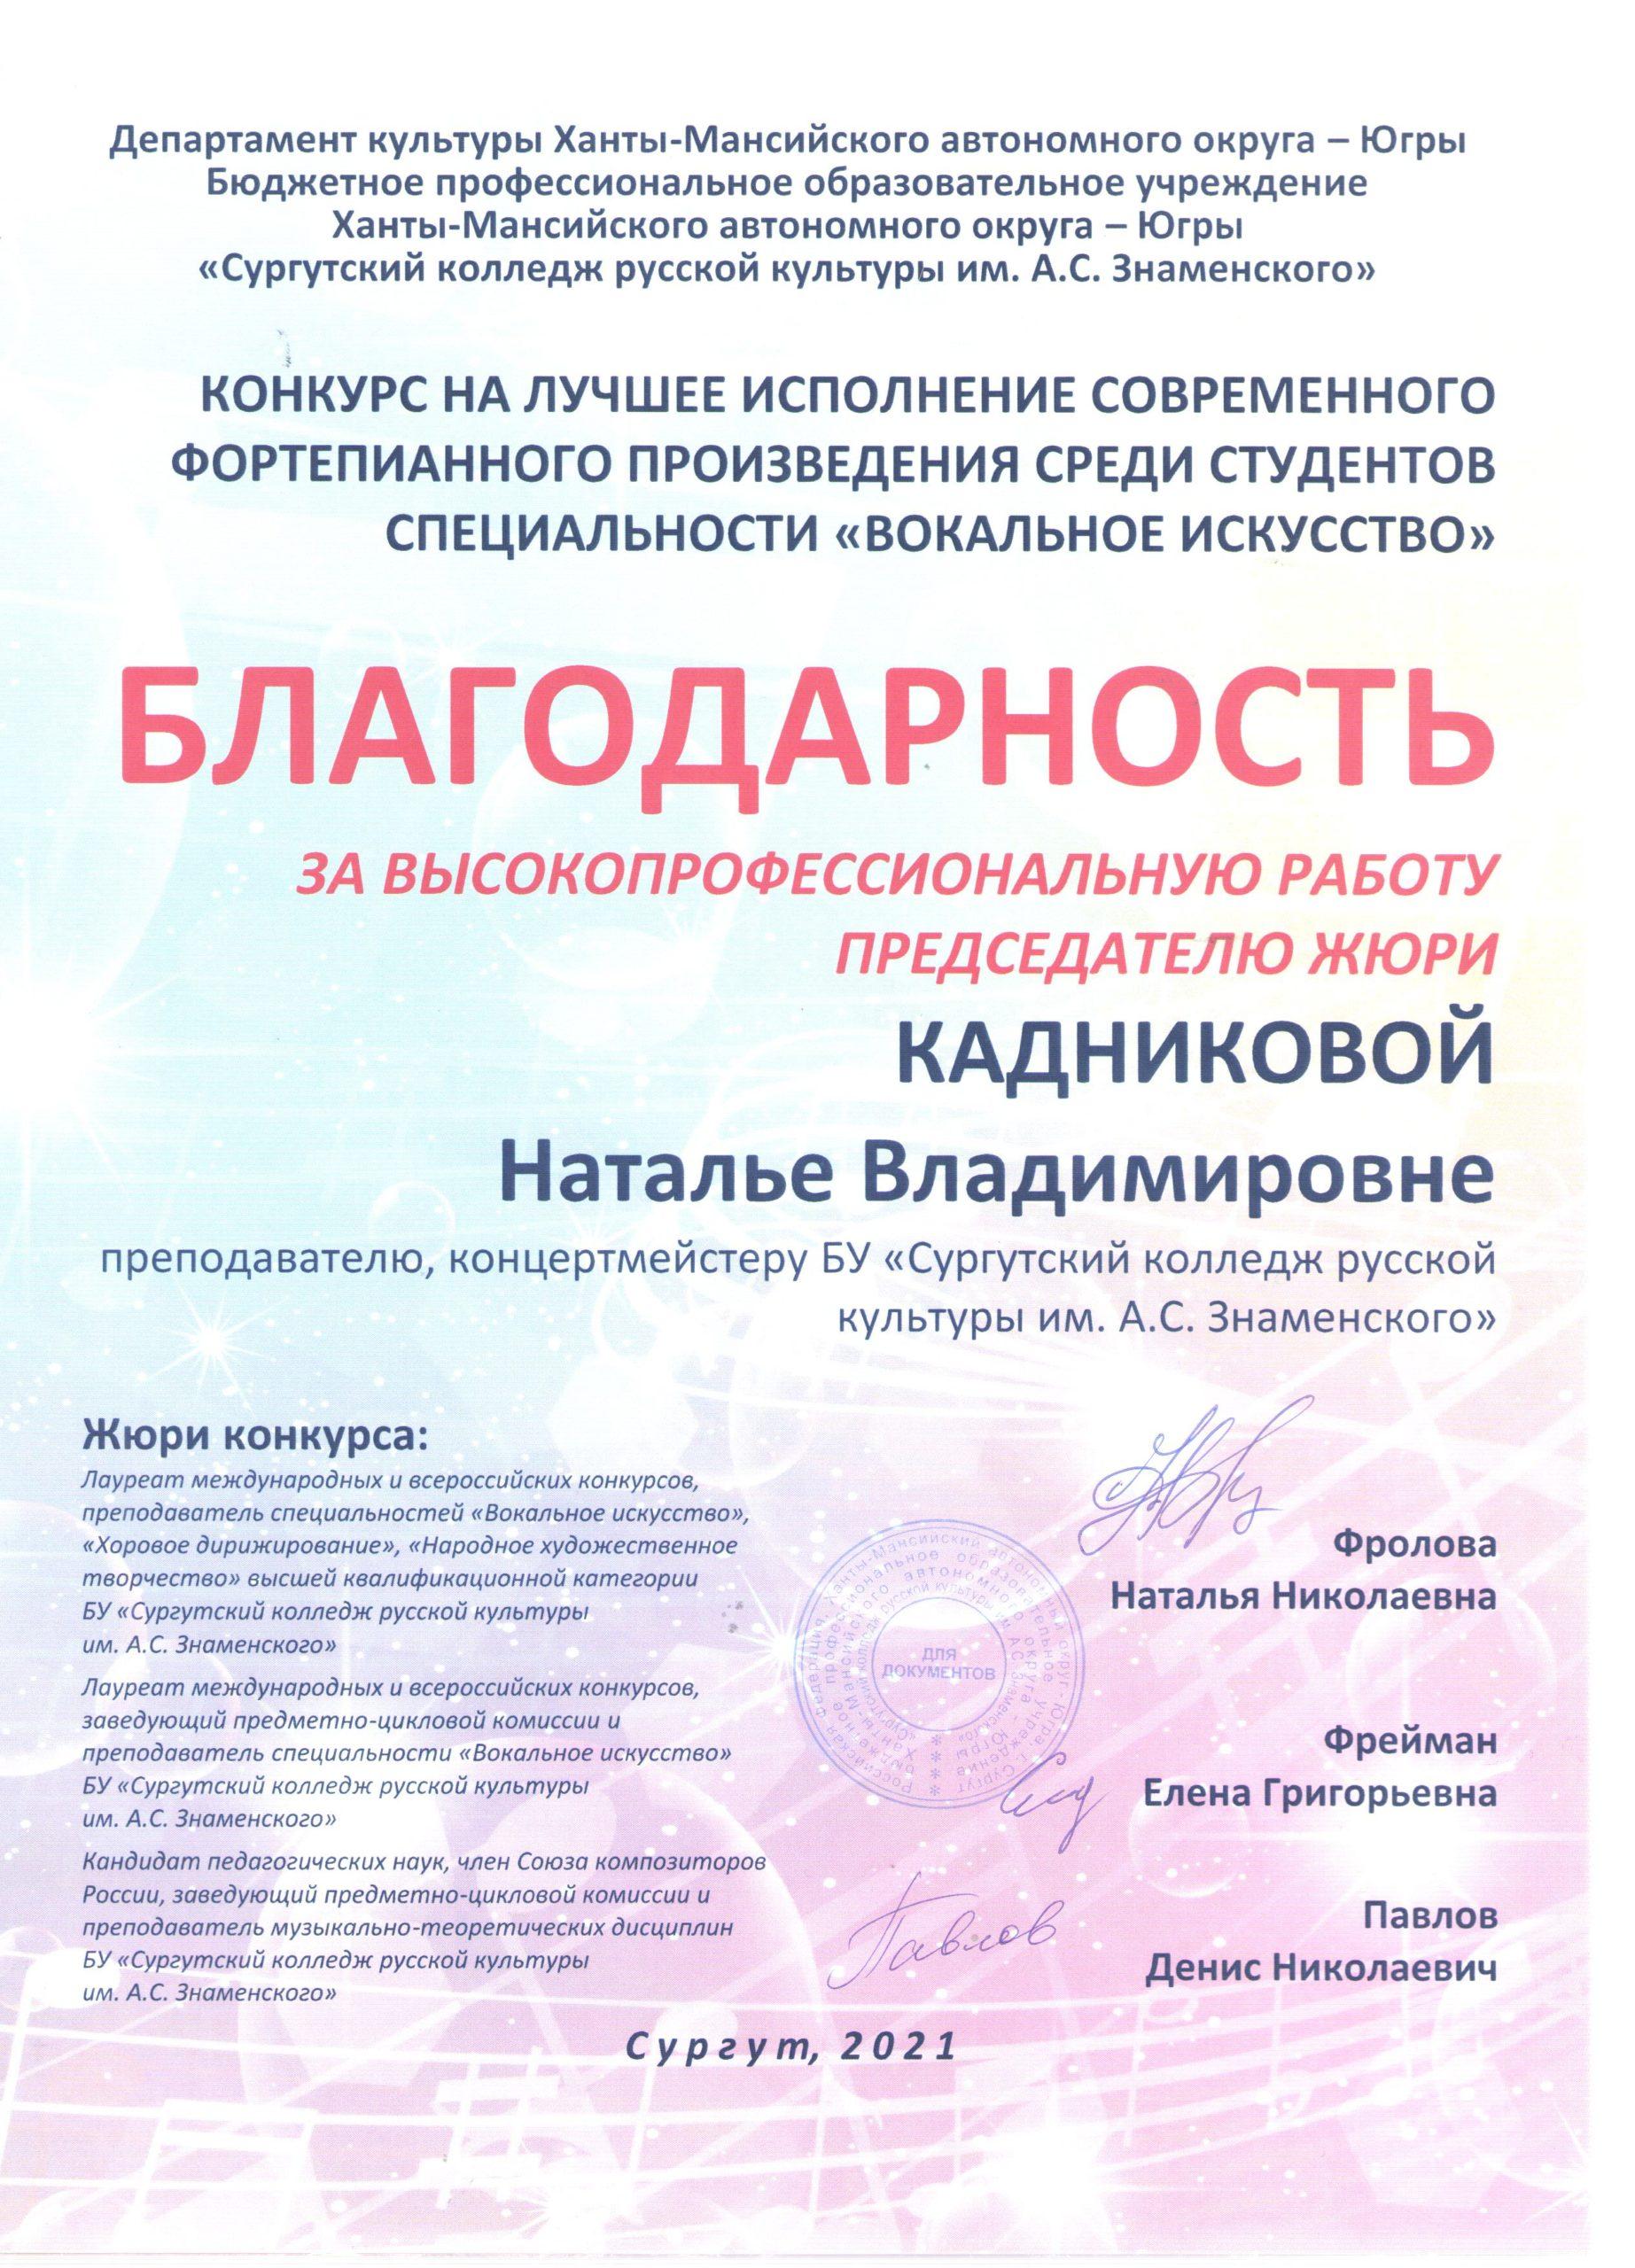 Кадникова